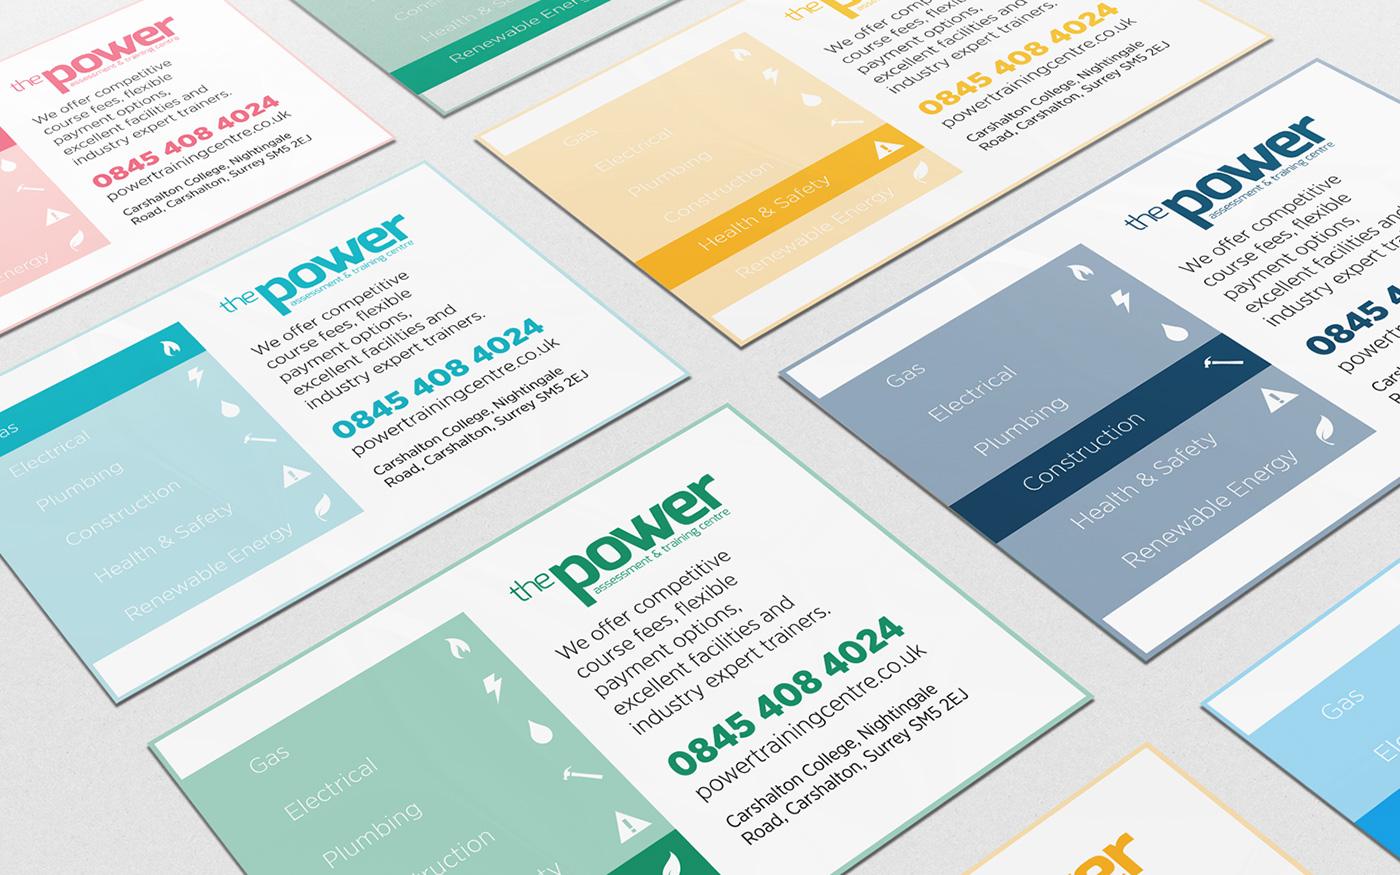 The Power Centre Course Card